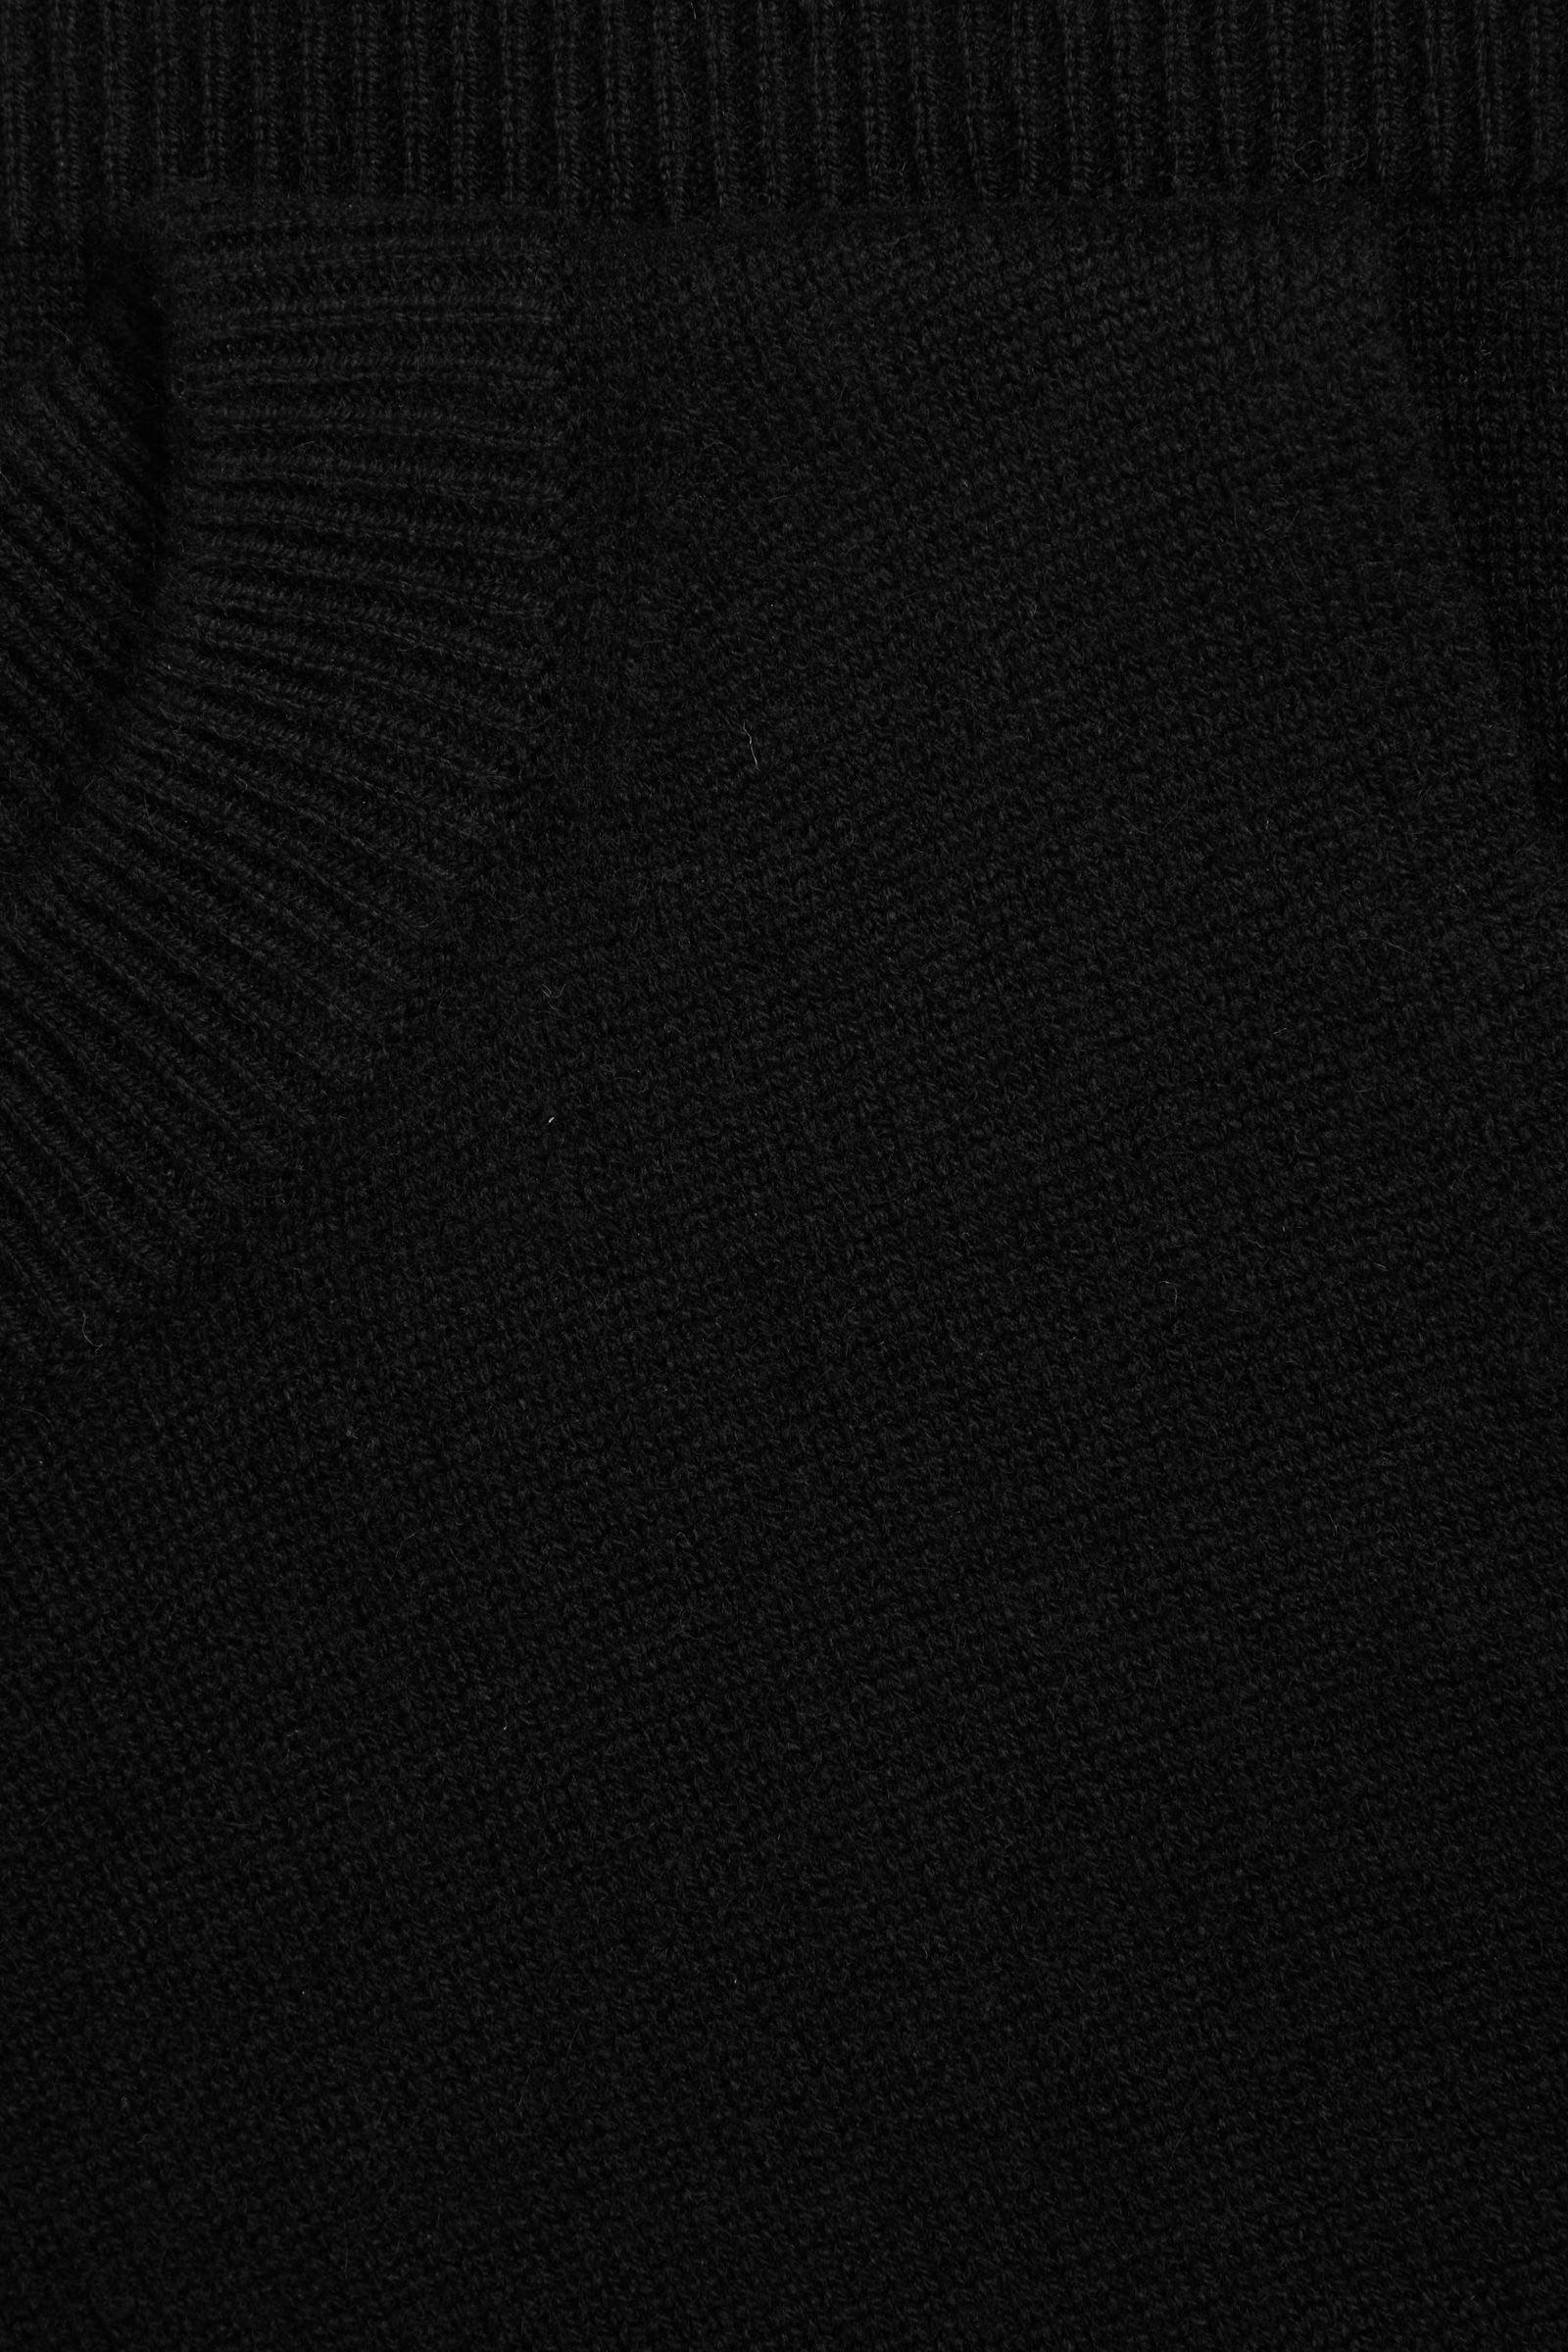 COS 캐시미어 플레인 니트 베스트의 블랙컬러 Detail입니다.